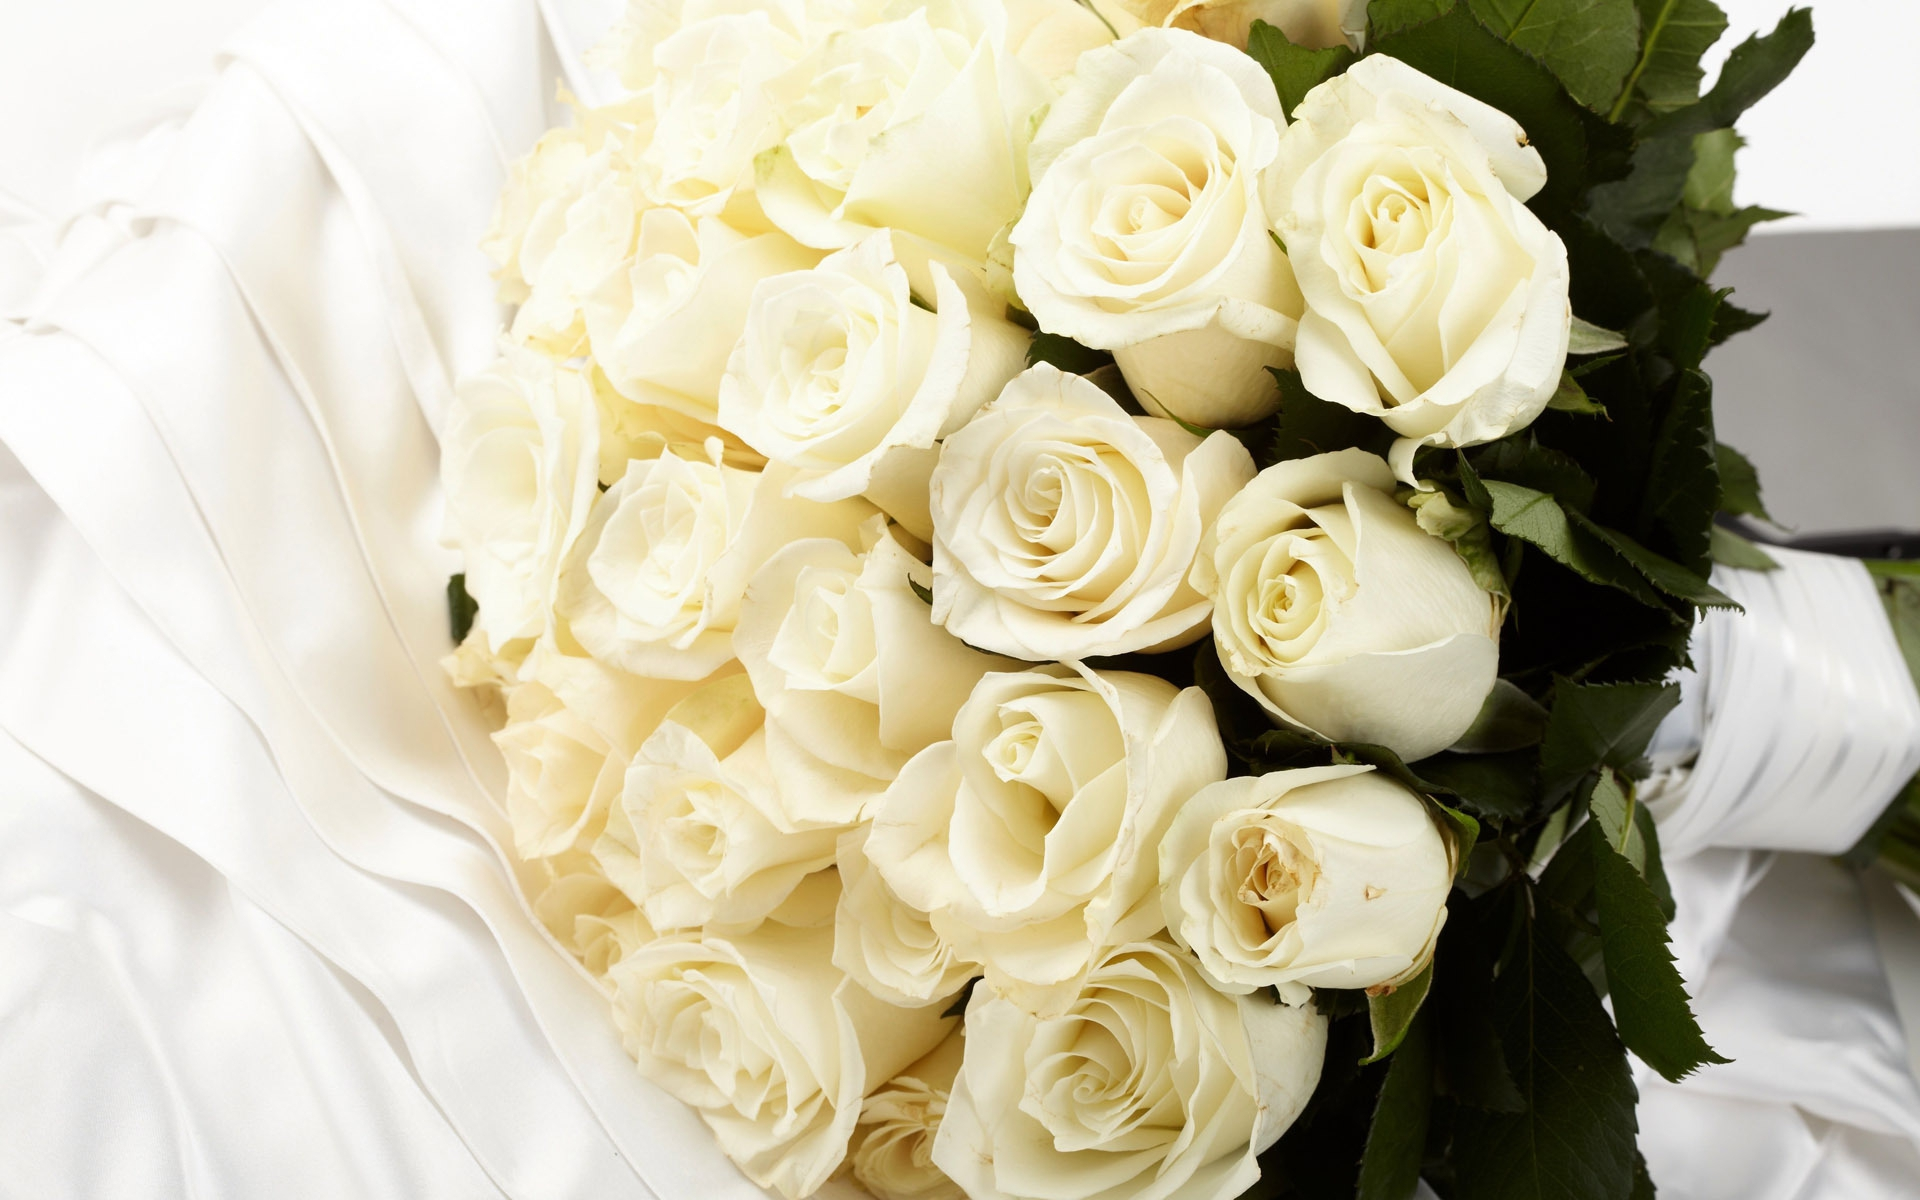 White Rose Desktop Images